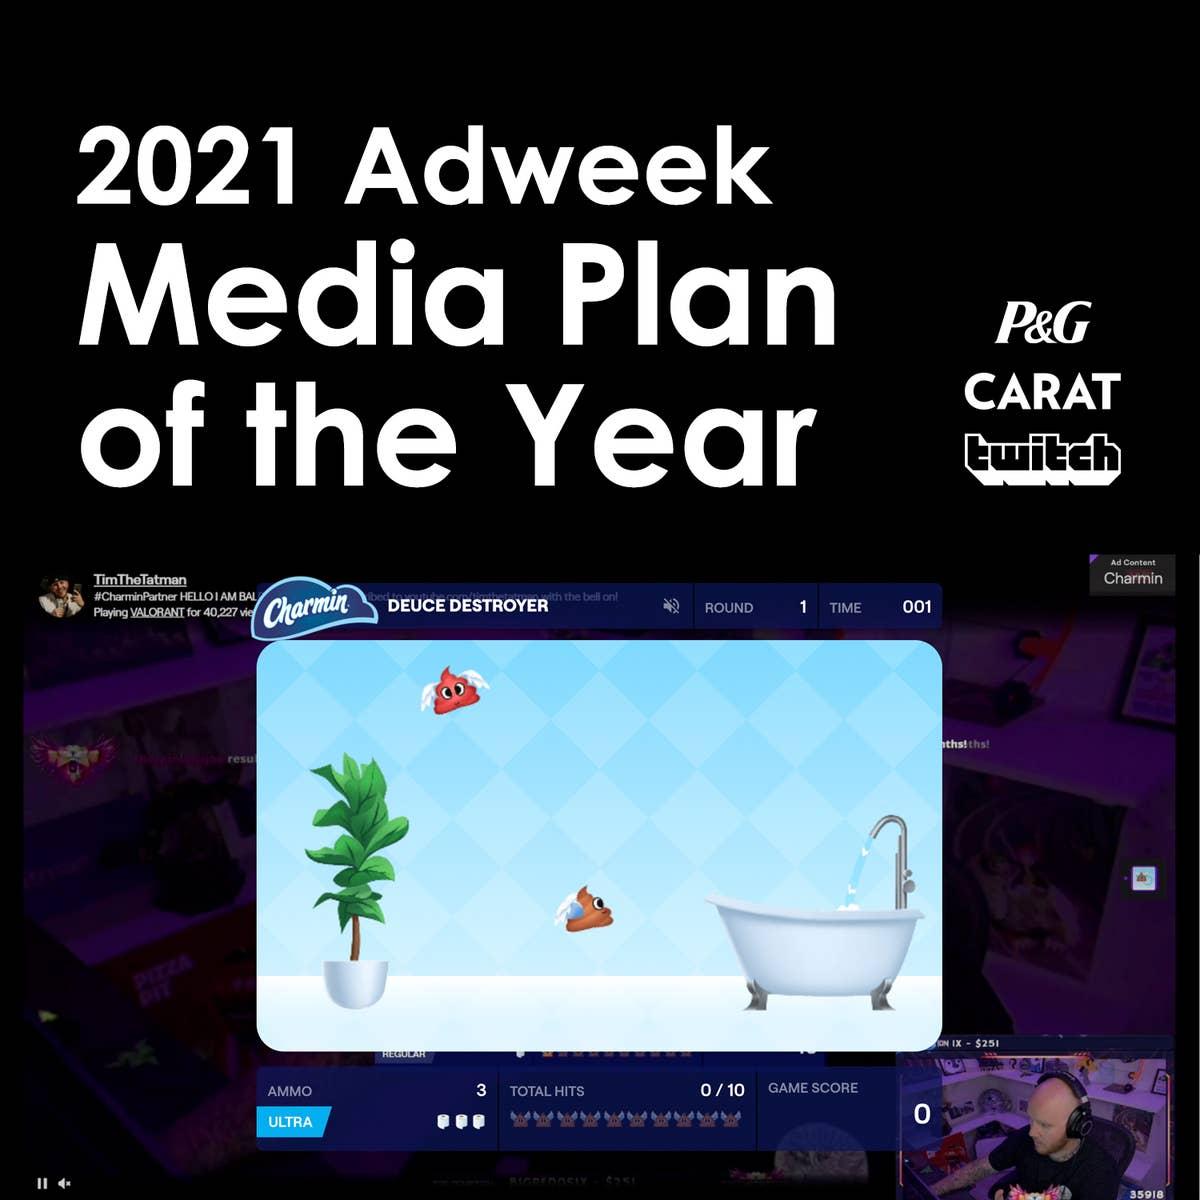 Charmin's Deuce Destroyer named Adweek Media Plan of the Year